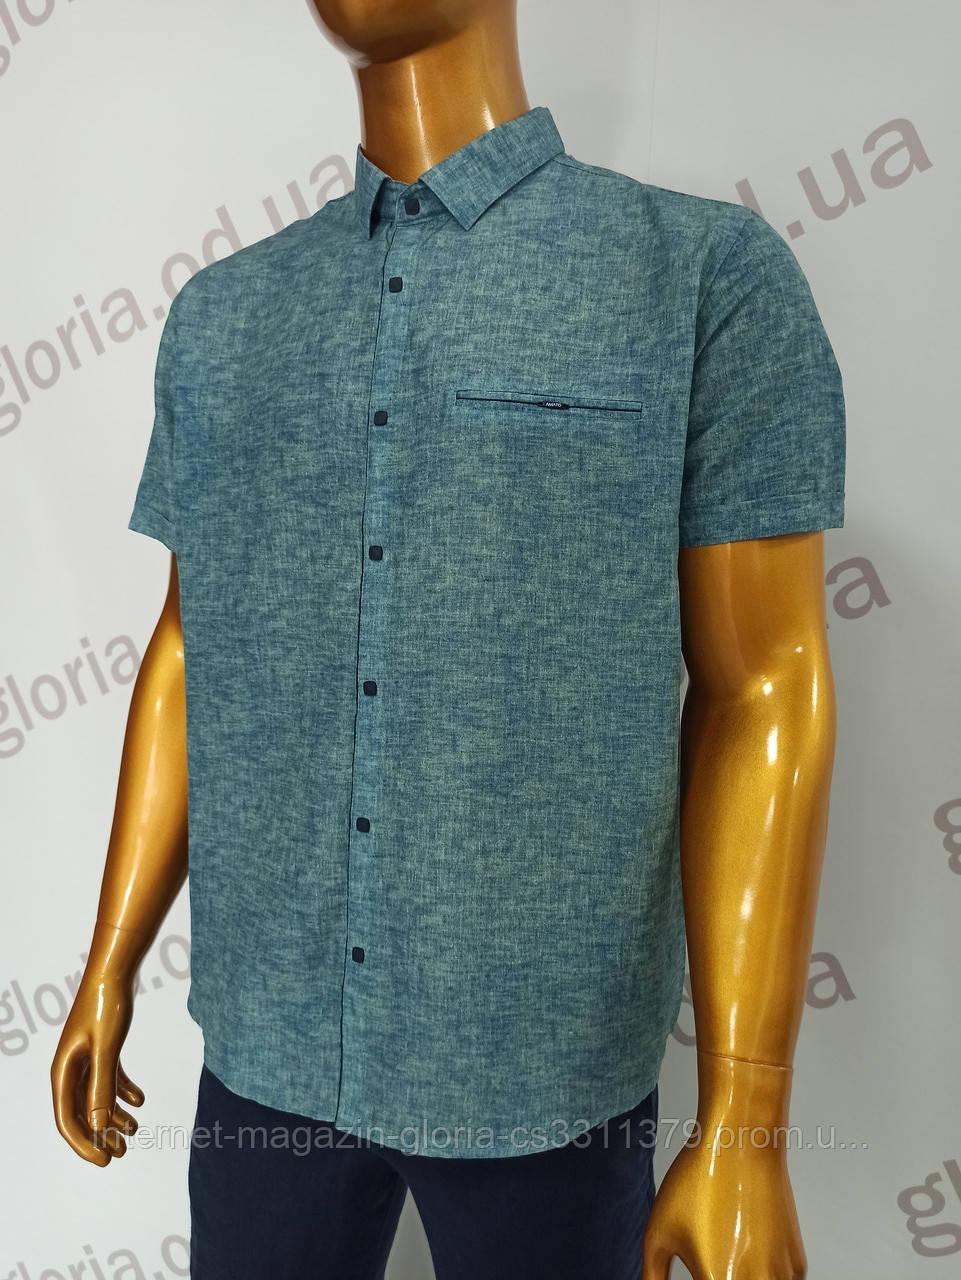 Мужская рубашка Amato. AG  29846(b). Размеры: Батал 2XL,3XL,4XL,5XL.